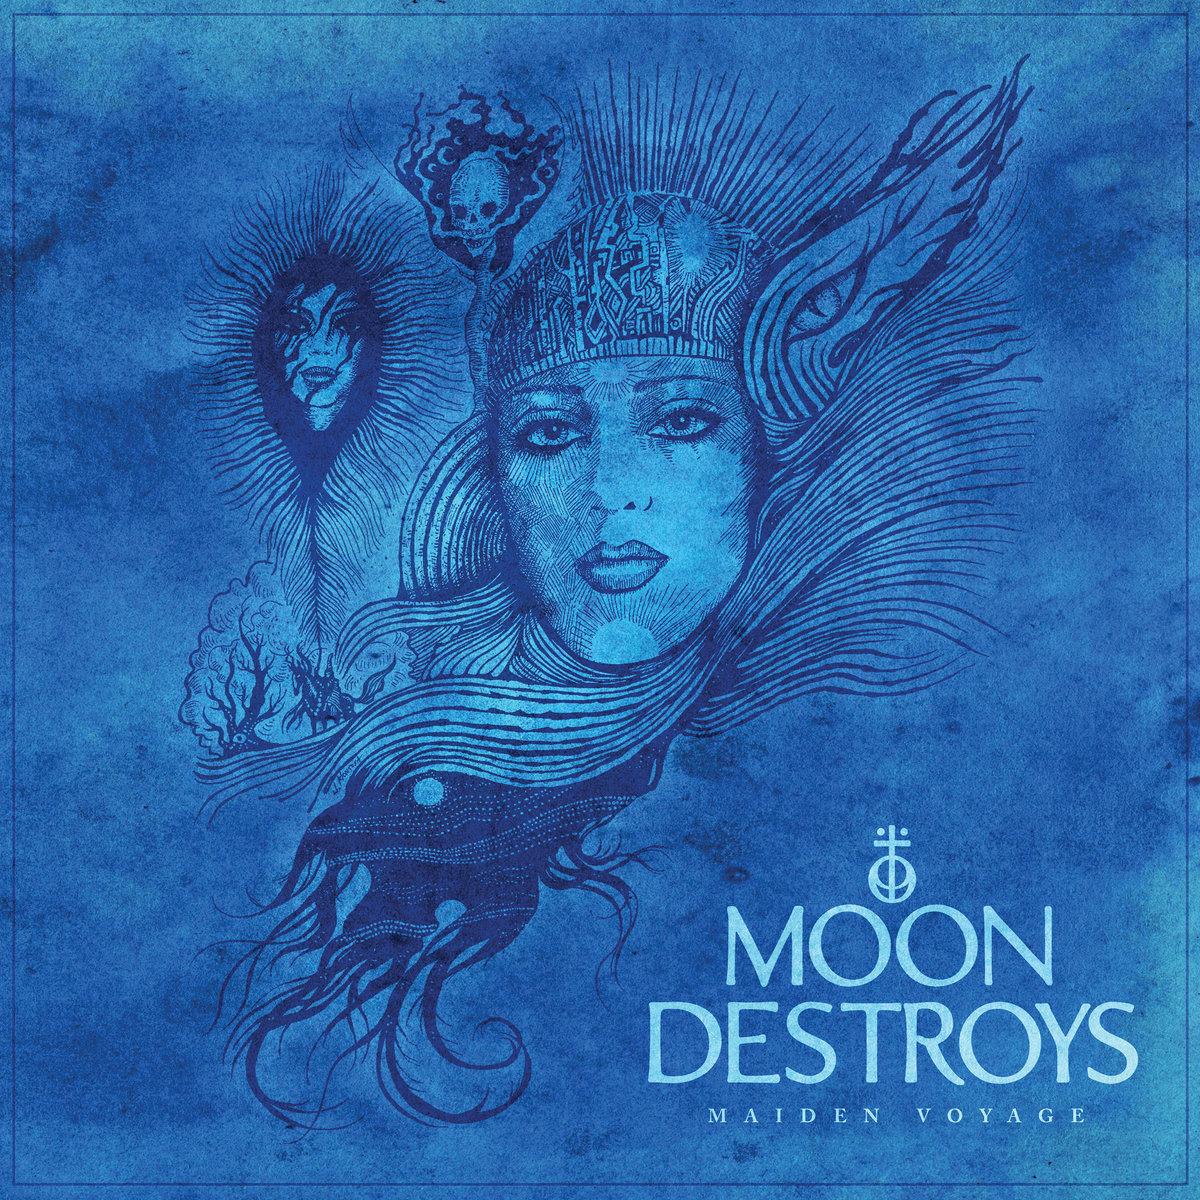 Moon Destroys - Maiden Voyage